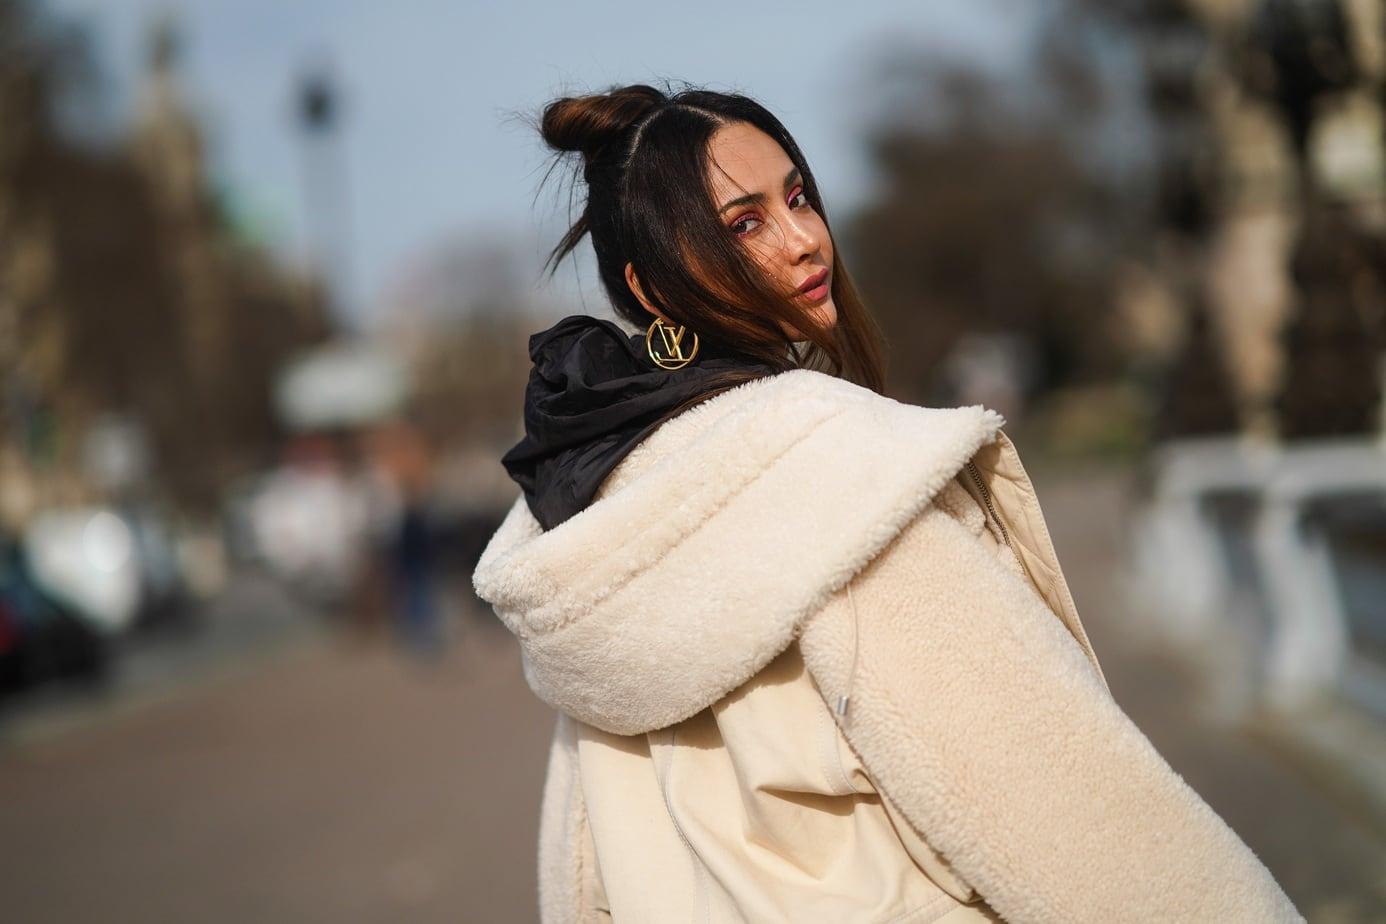 Fashion Photo Session In Paris – February 2021